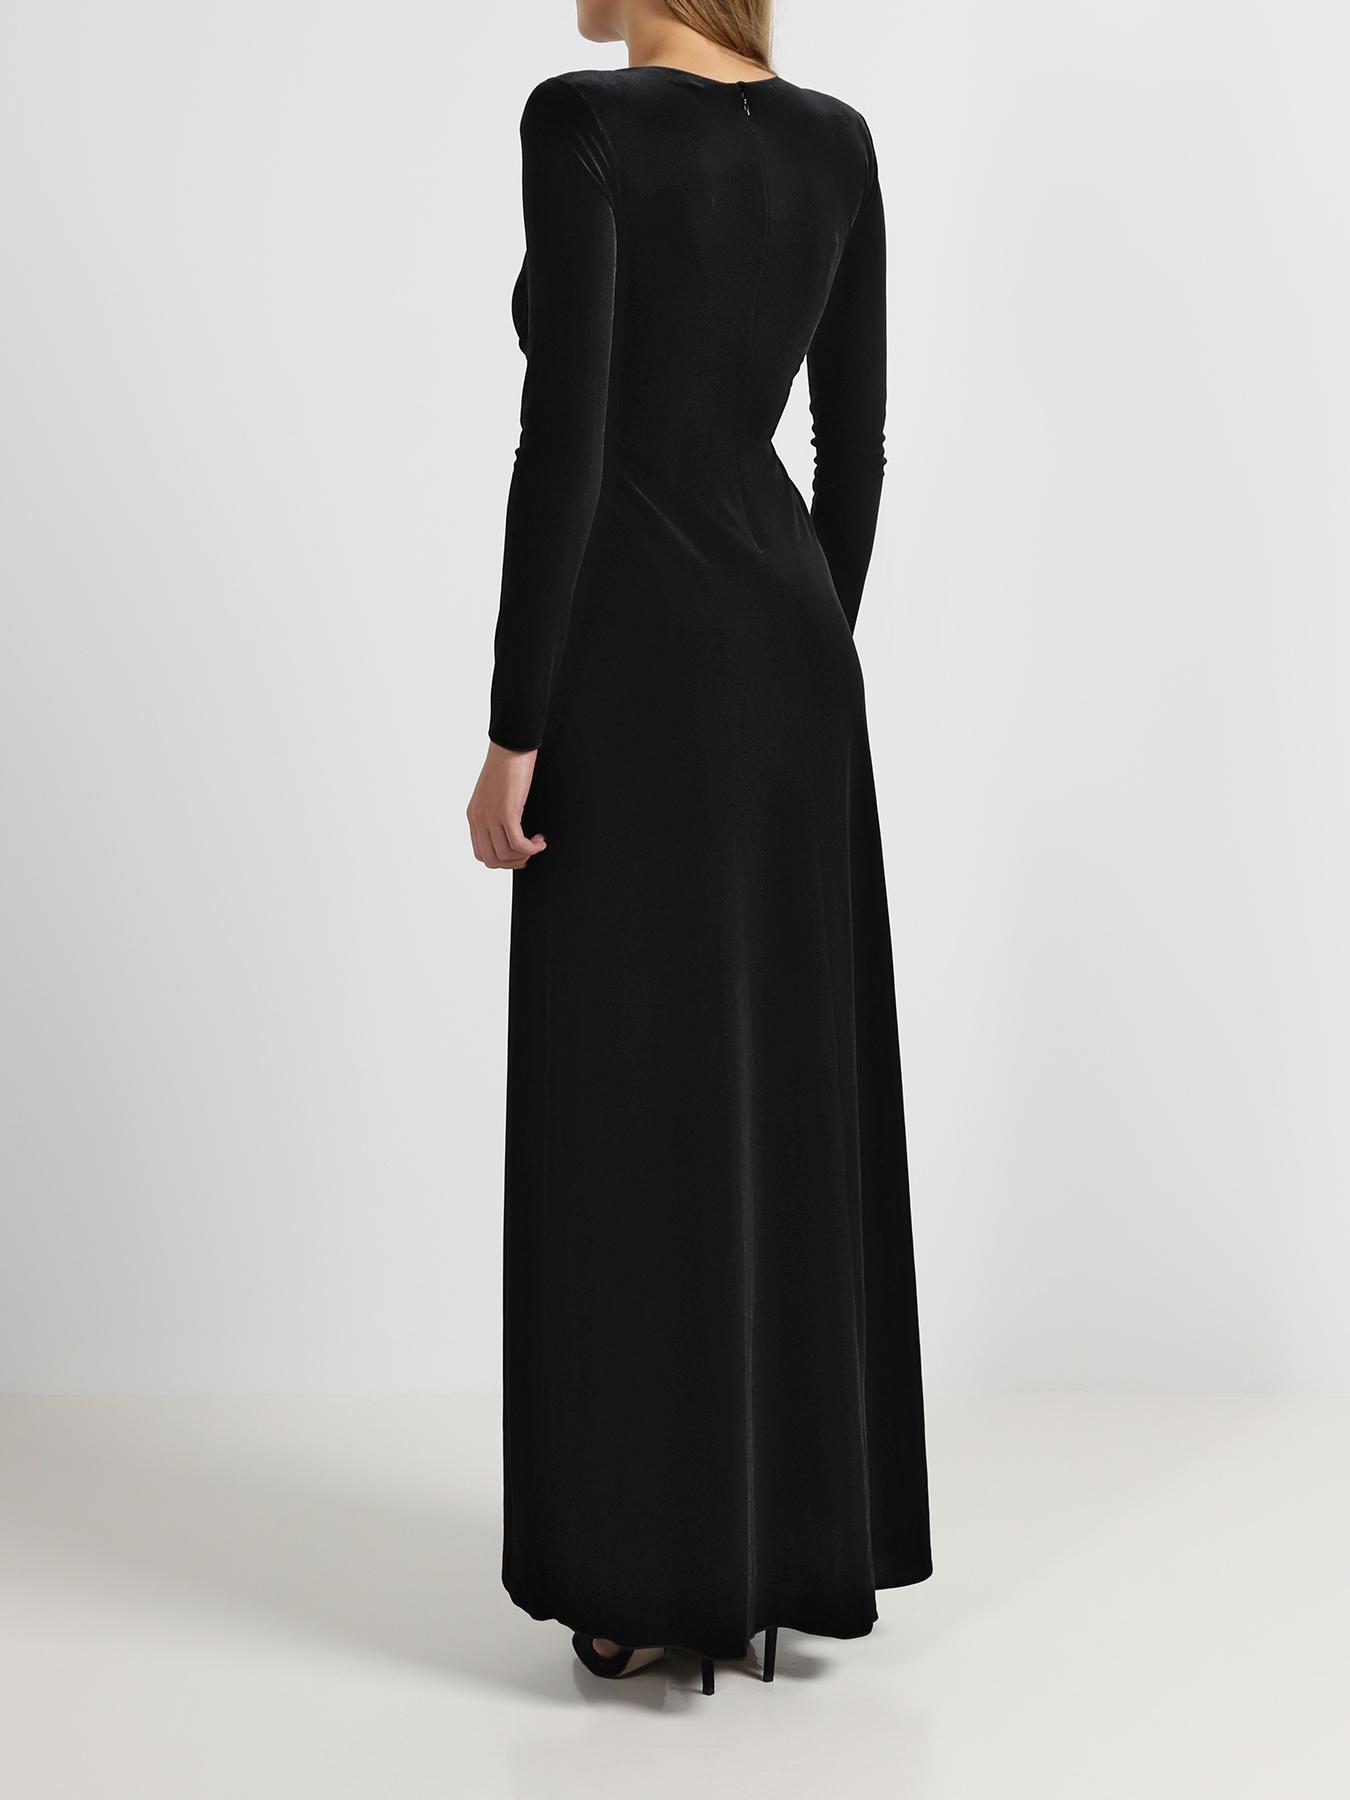 Платье Emporio Armani Платье-макси cyrille gassiline черное платье макси